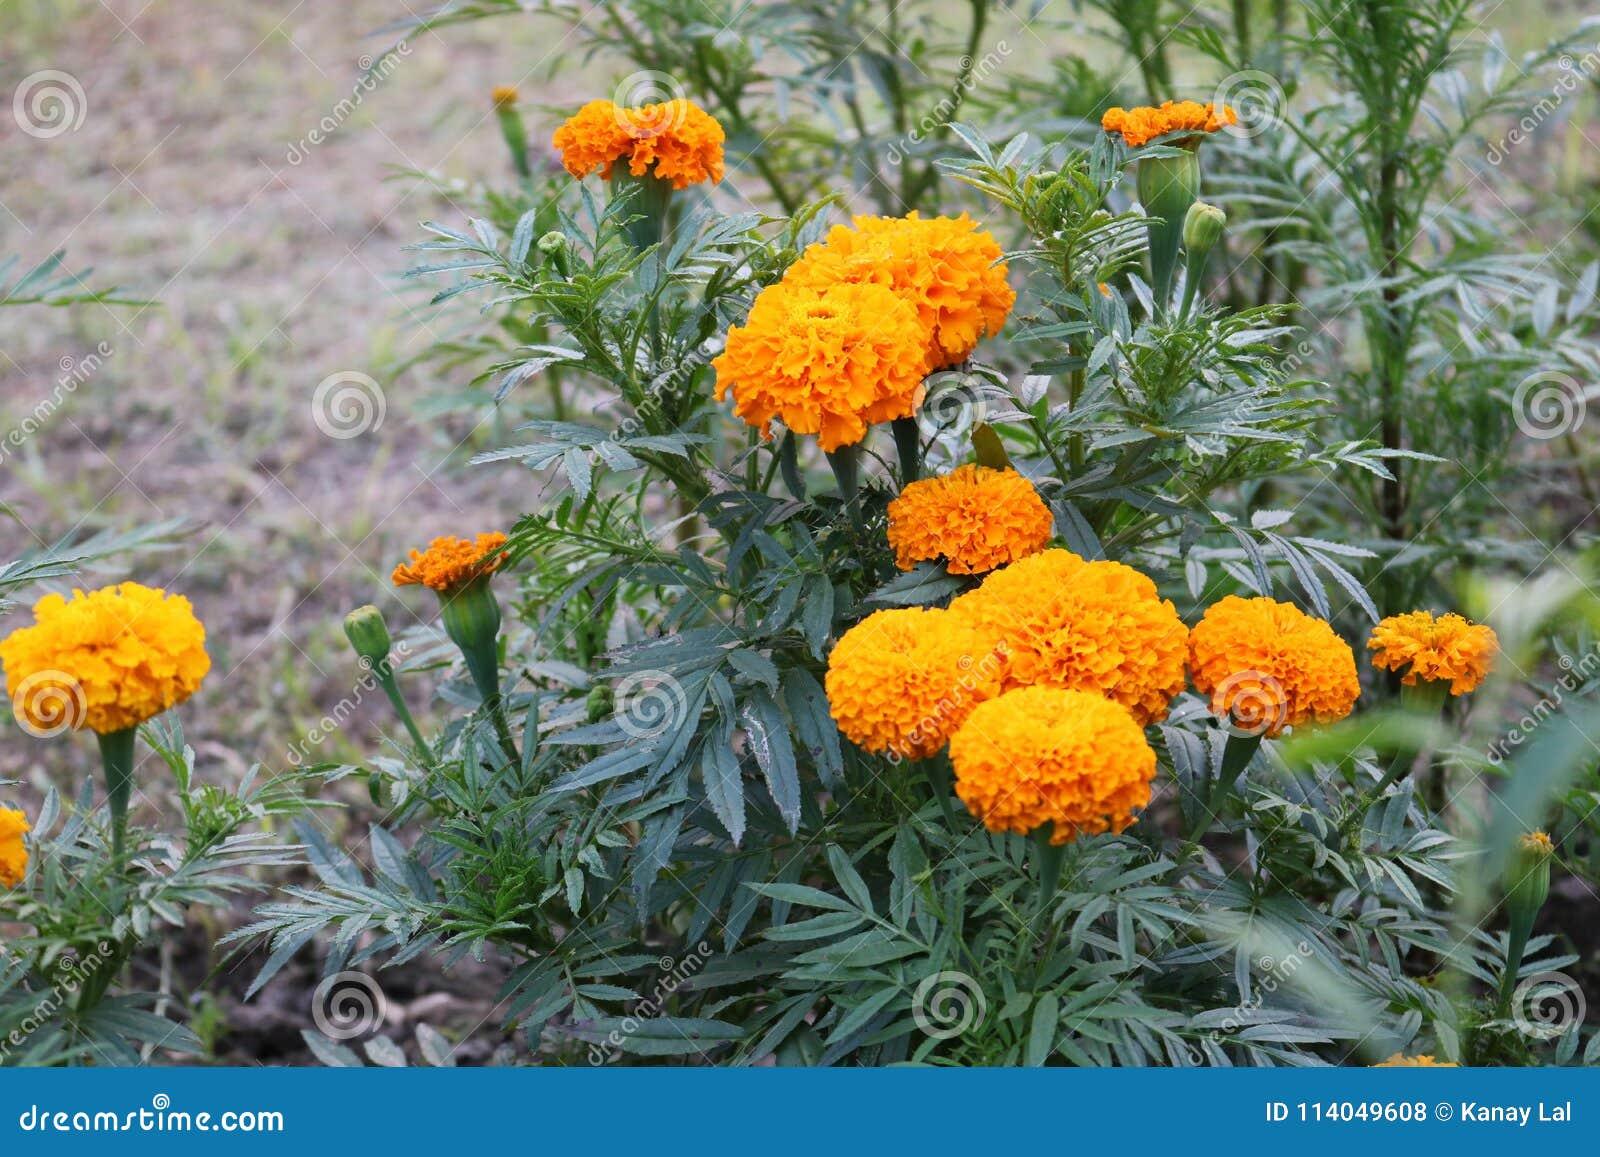 Bangladeshi Beautiful Yellow Big Marigold Flowers In Garden